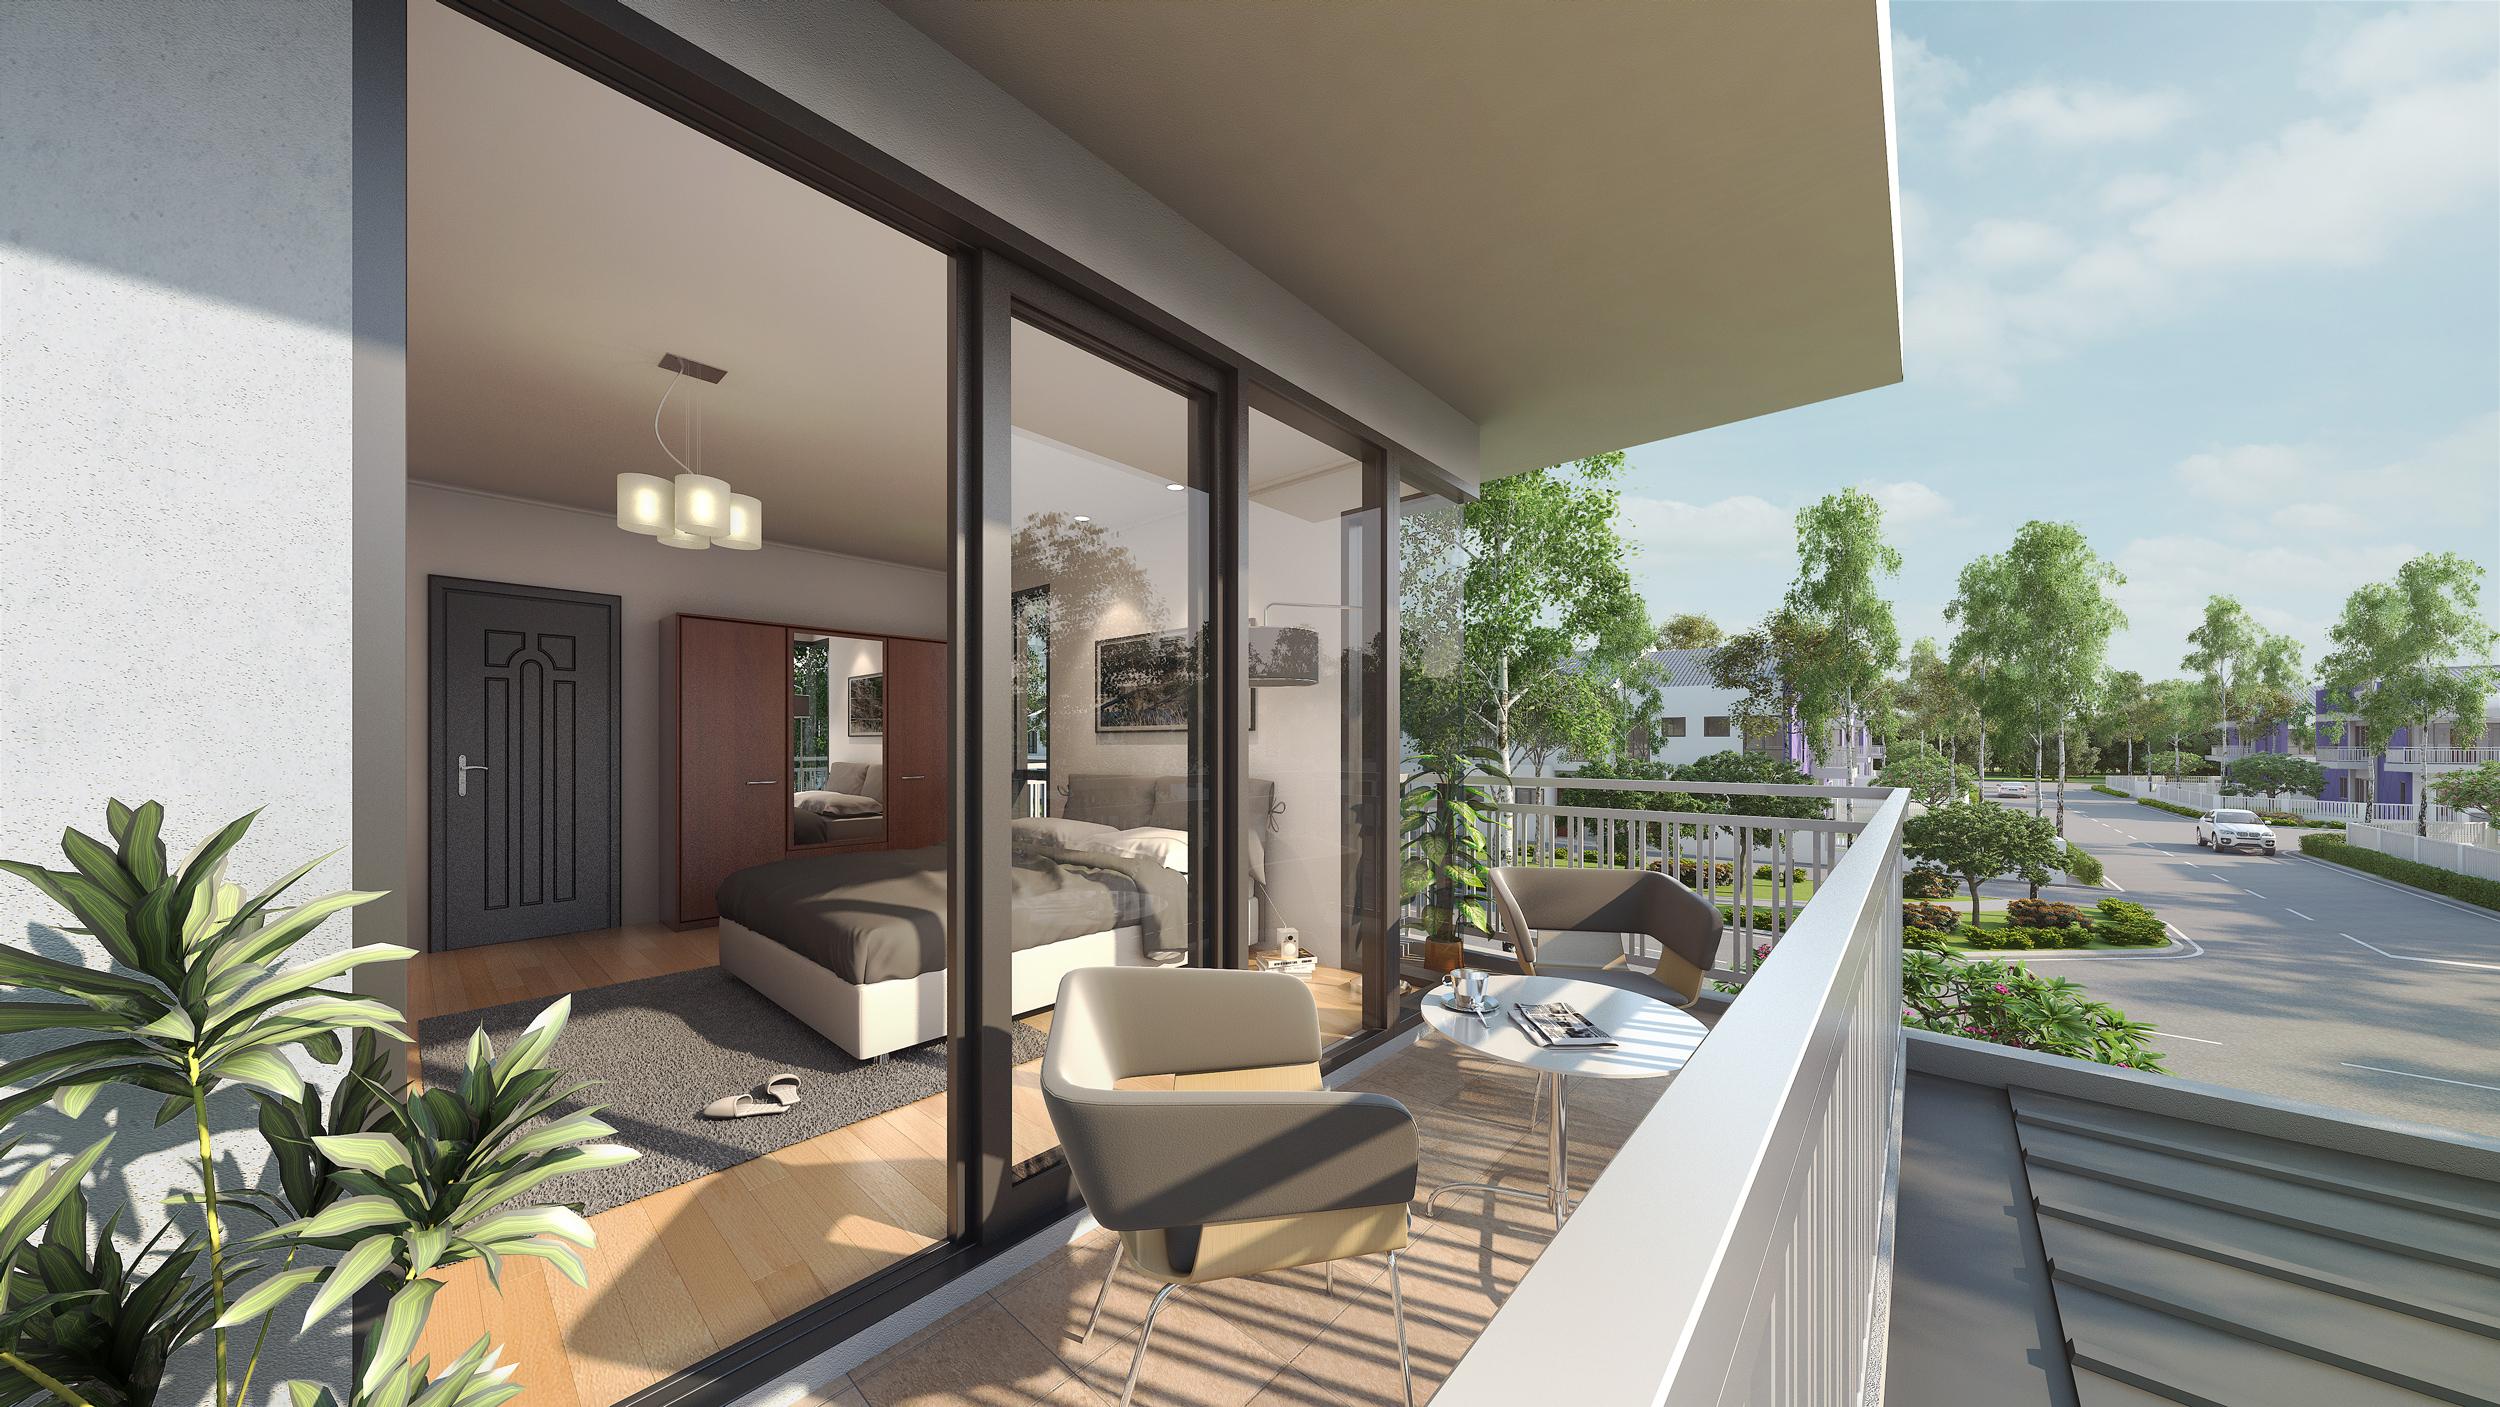 terresse_balcony_09Mar-lowres.jpg